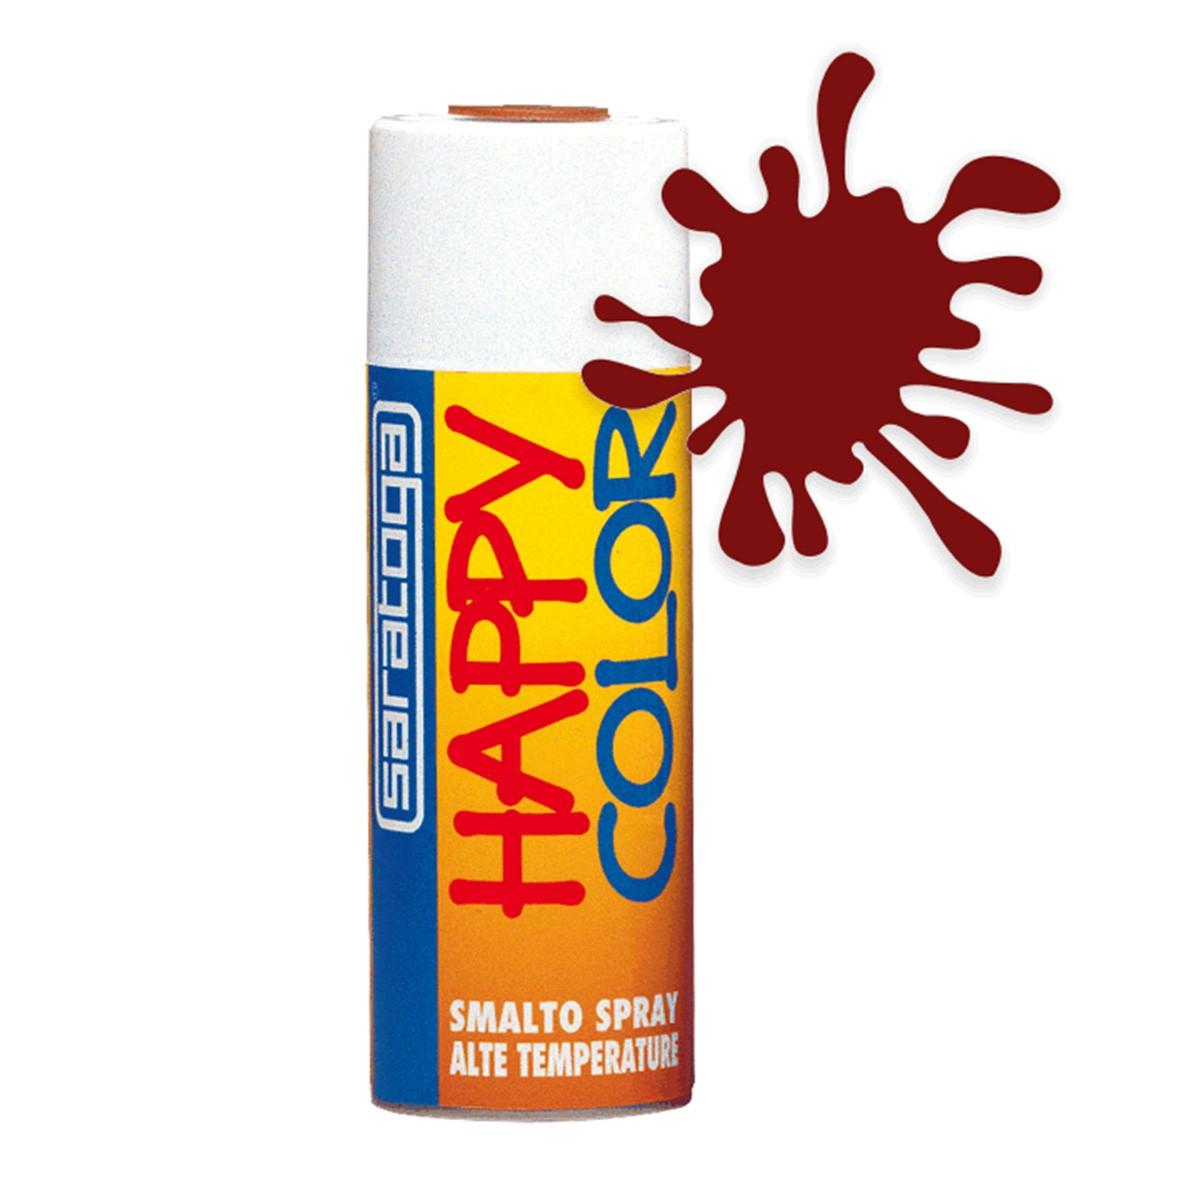 Vopsea spray temperatura ridicata